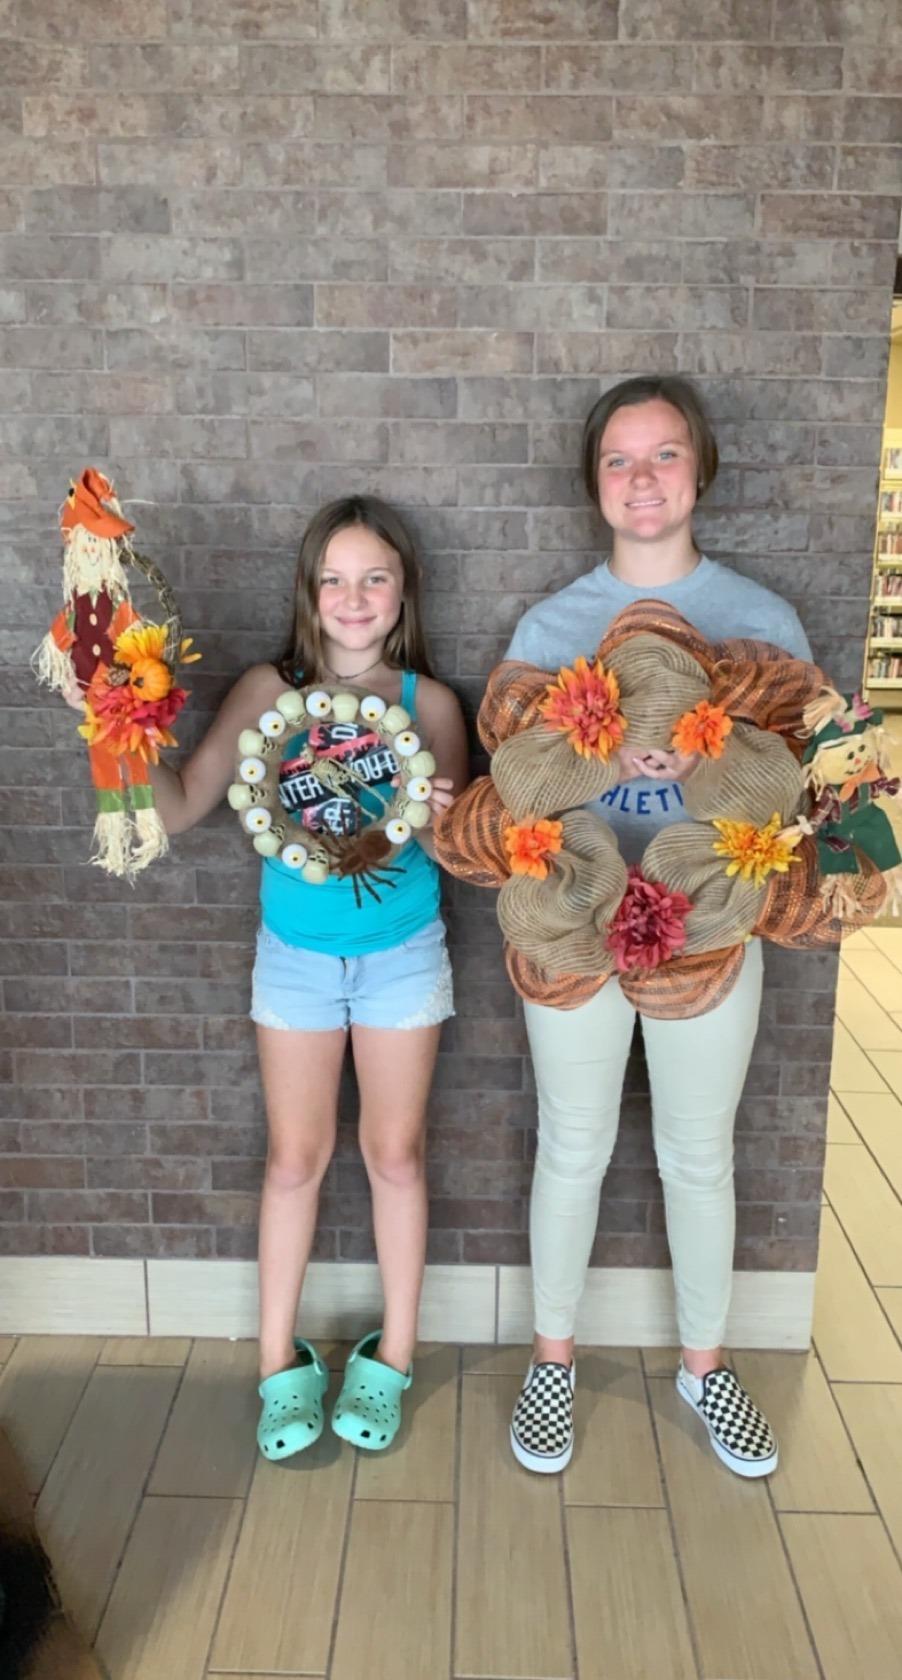 Cam_Halloween-_fall wreath